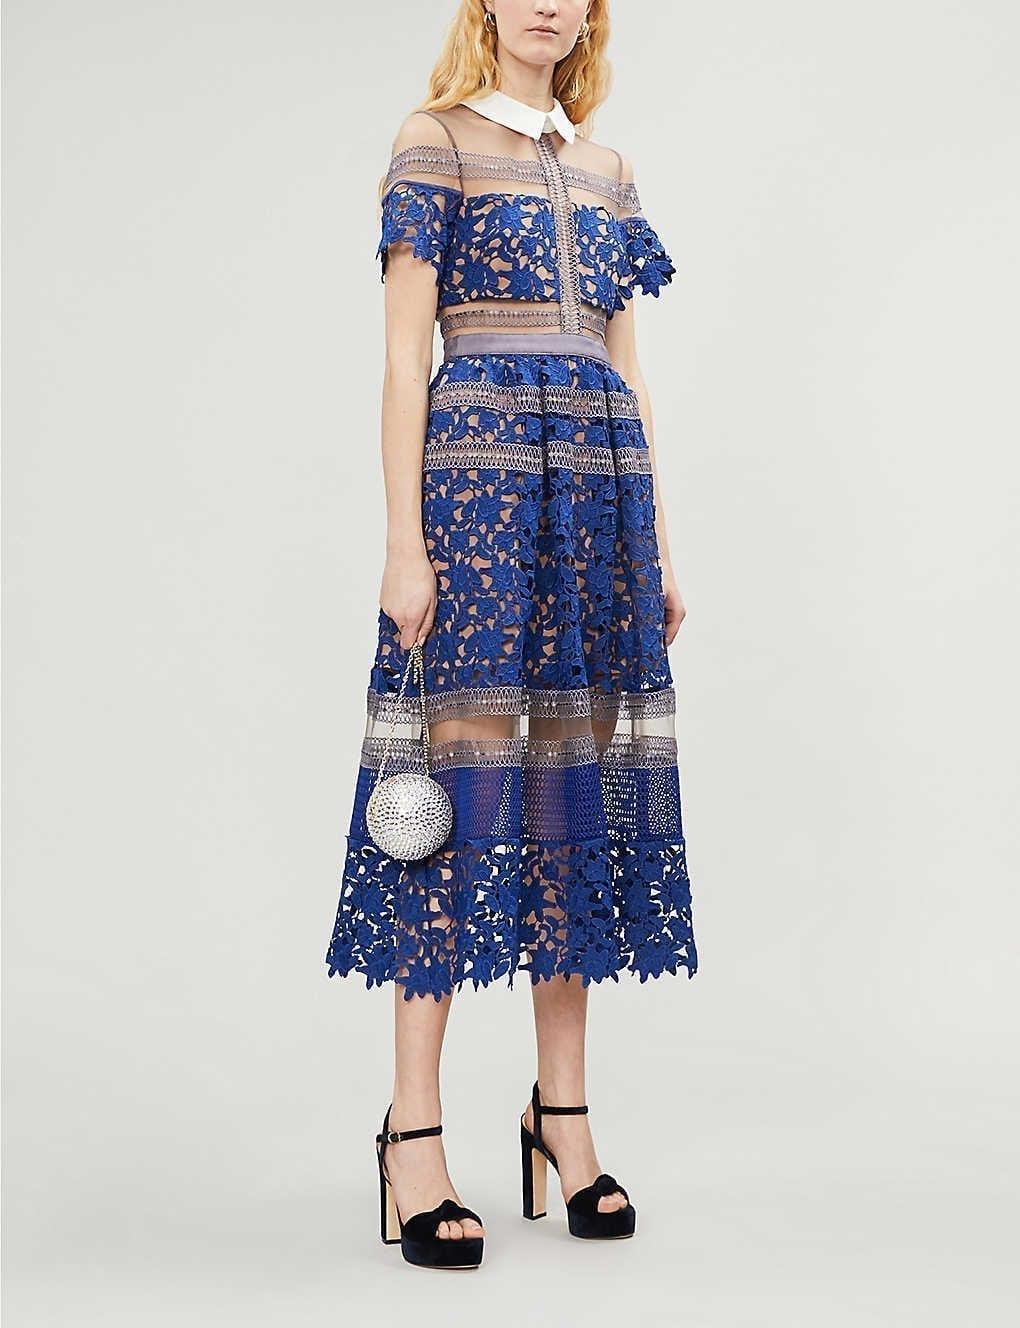 SELF-PORTRAIT Liliana Panelled Lace Midi Dress